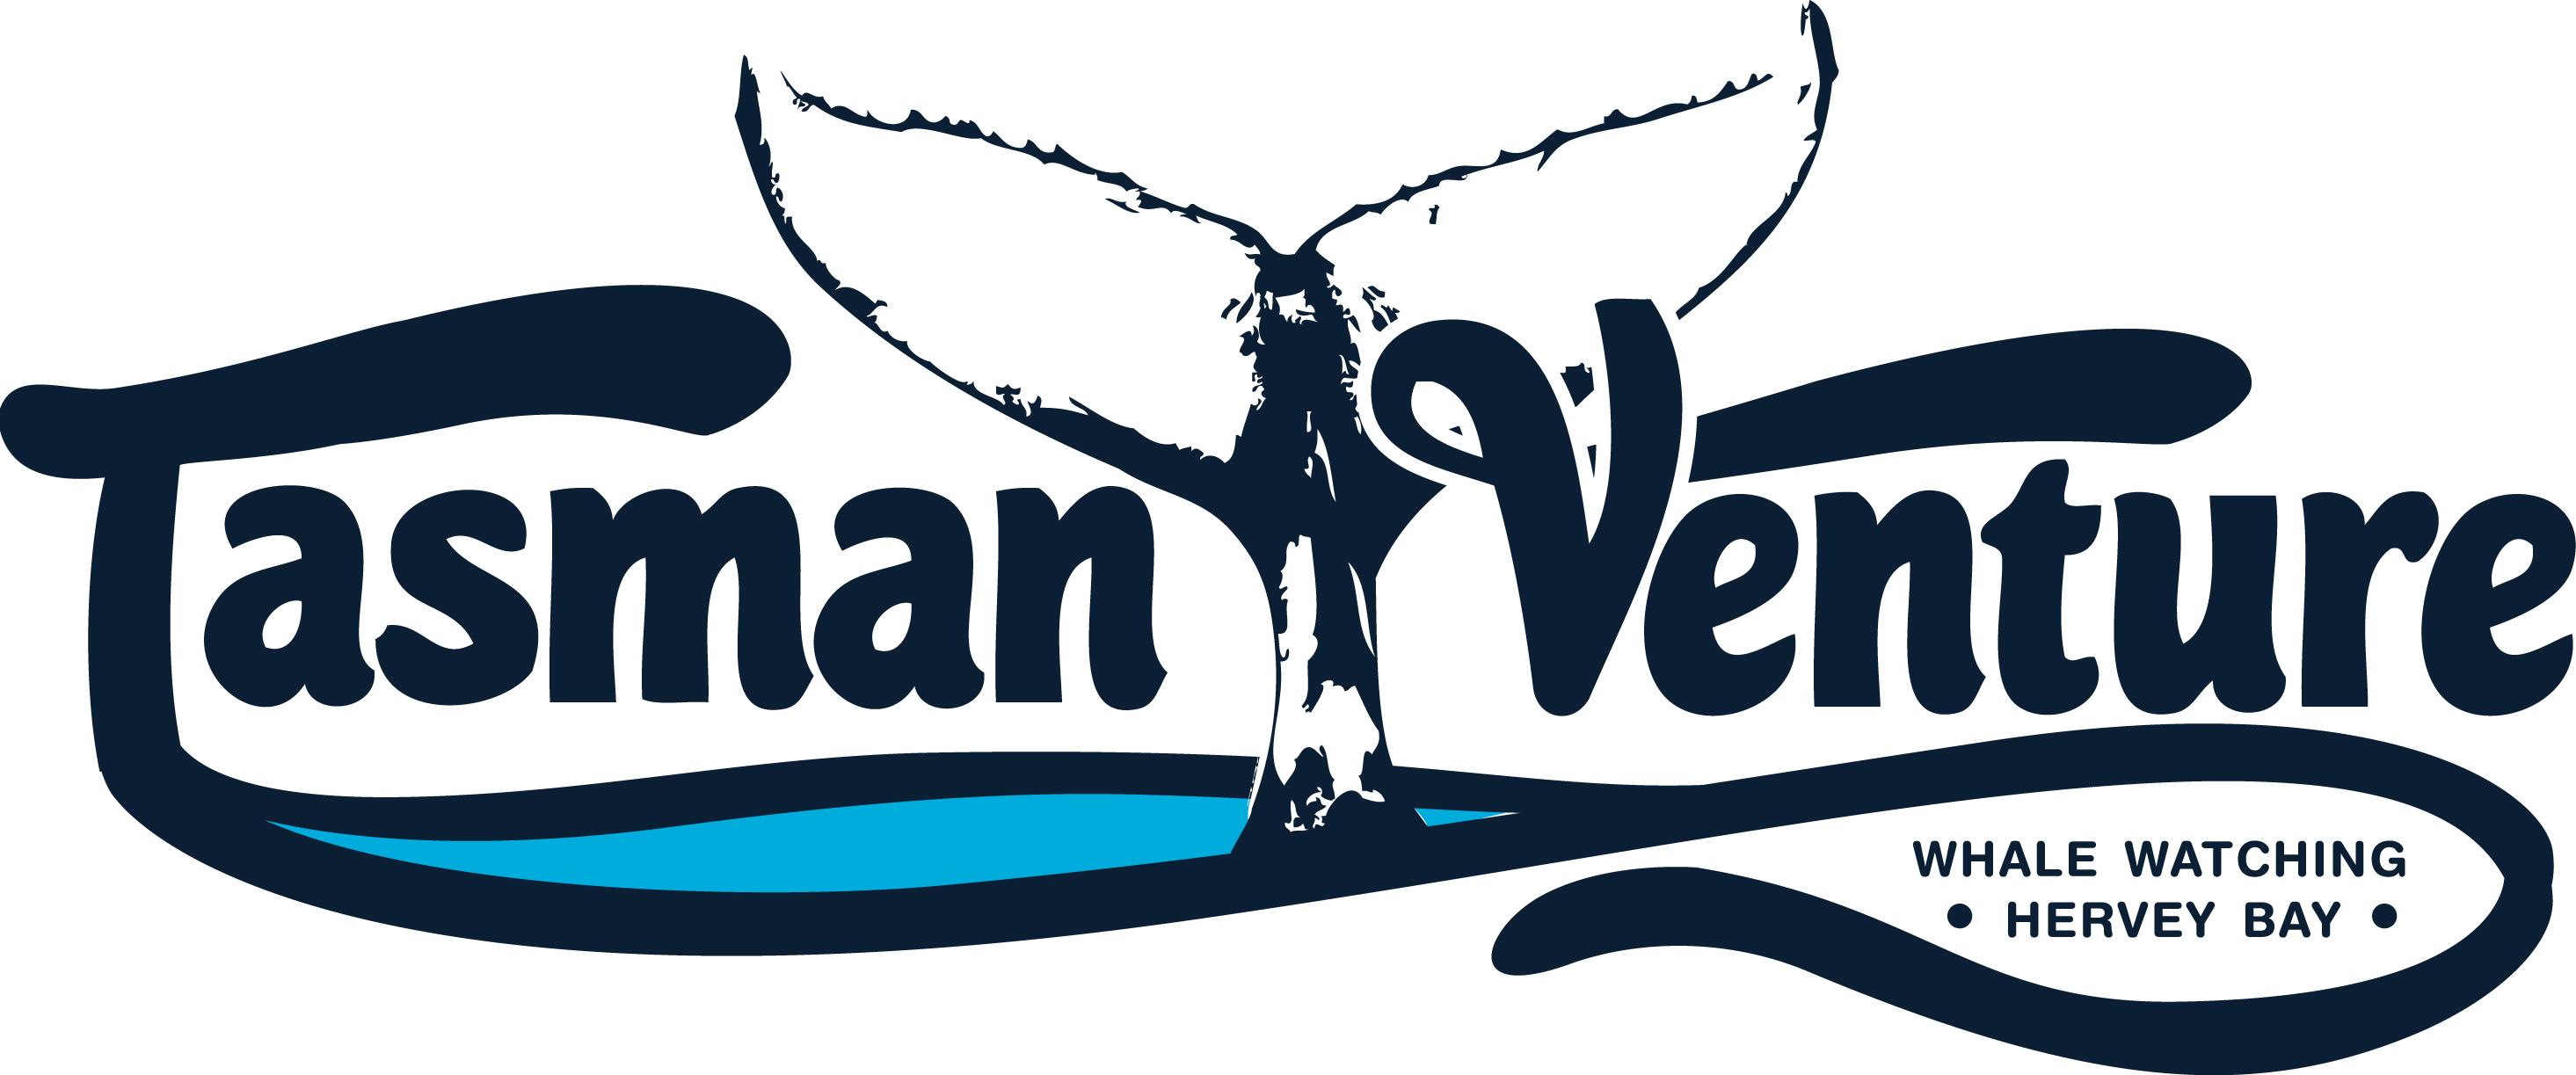 Tasman Venture - Fraser Island Tour